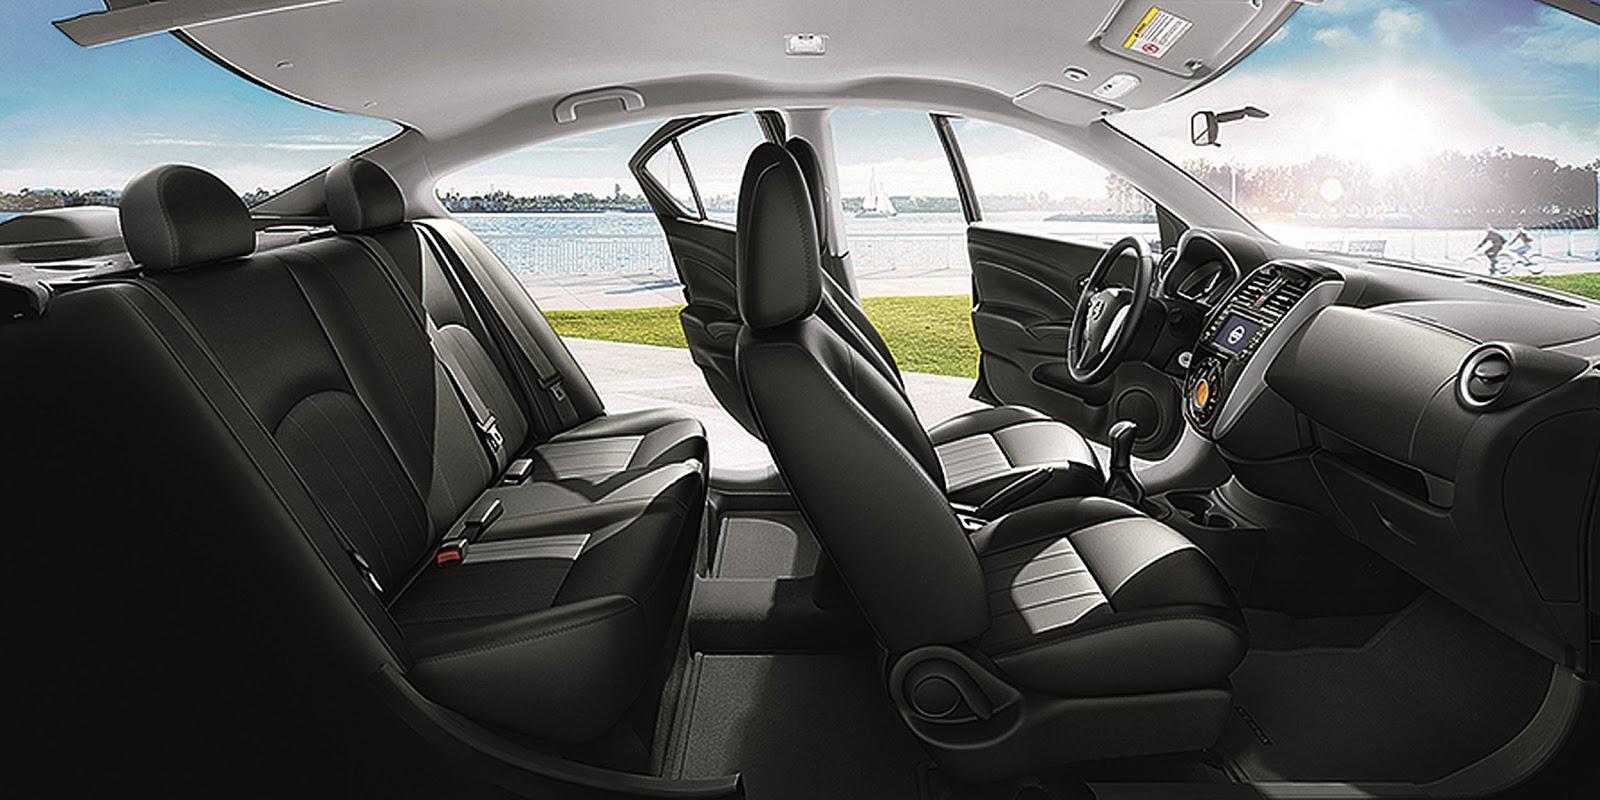 novo Nissan Versa 2015 - interior